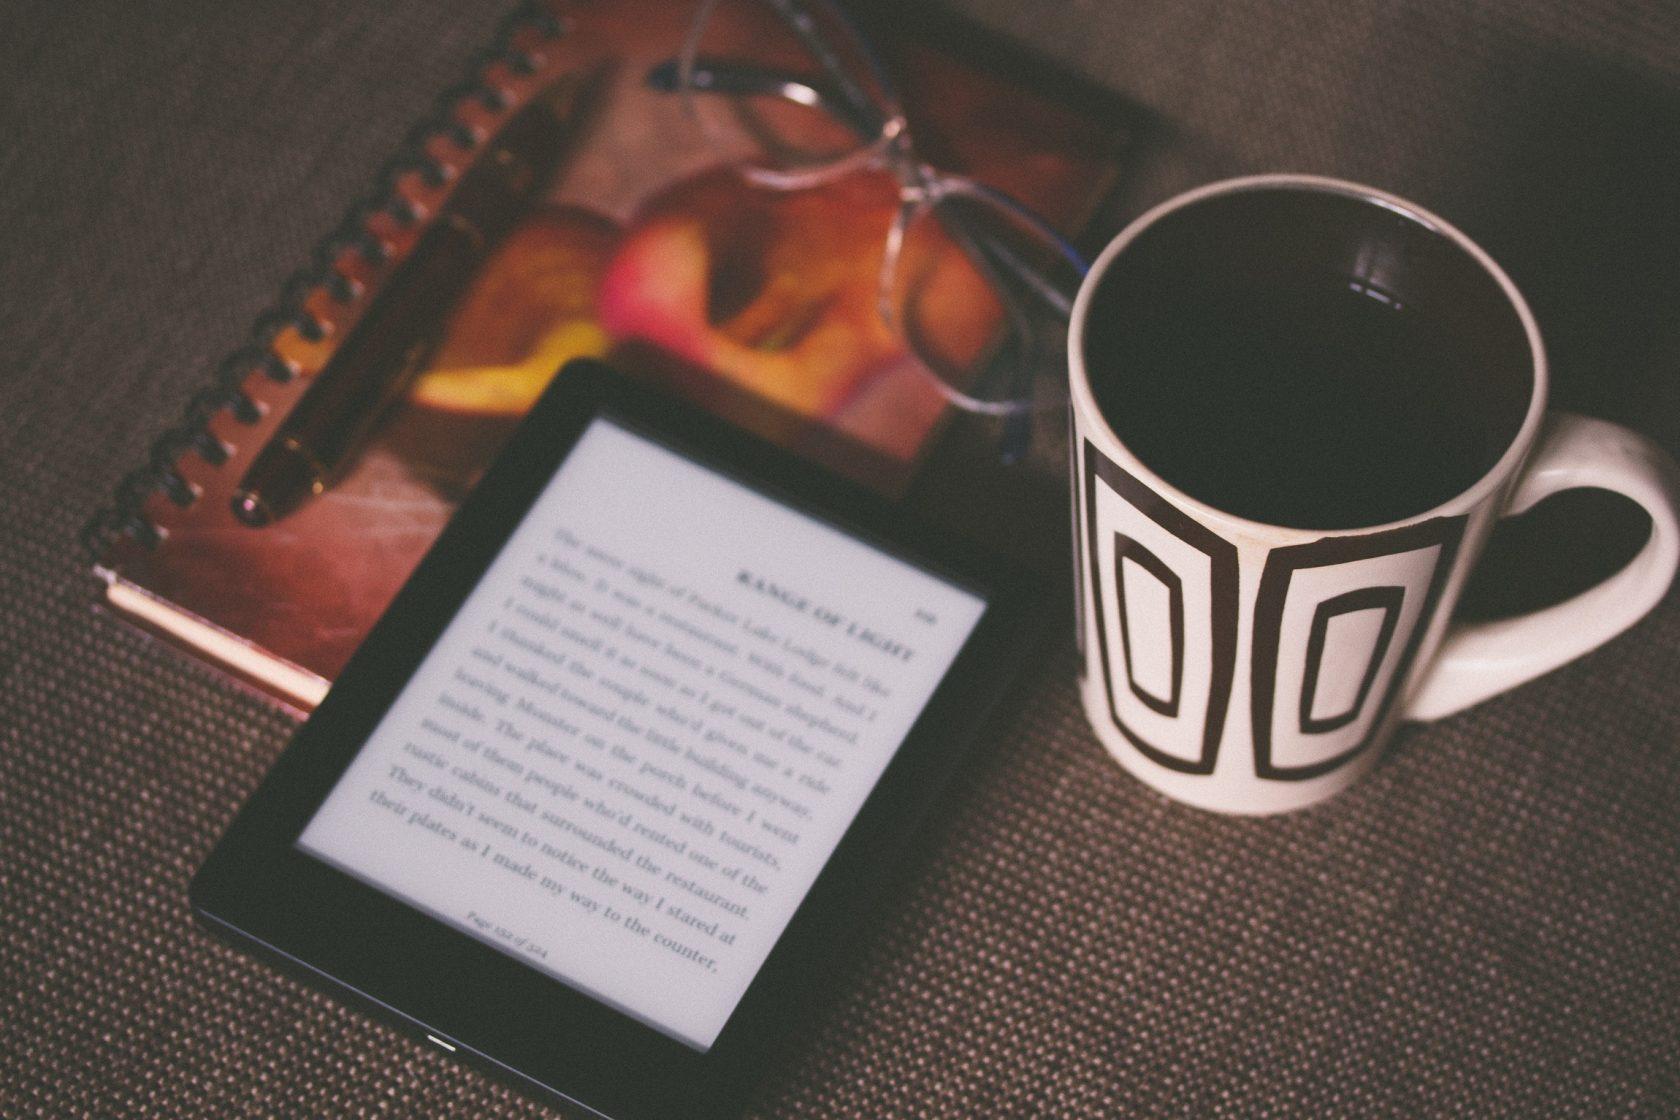 monetise your website make money online digital product ebook